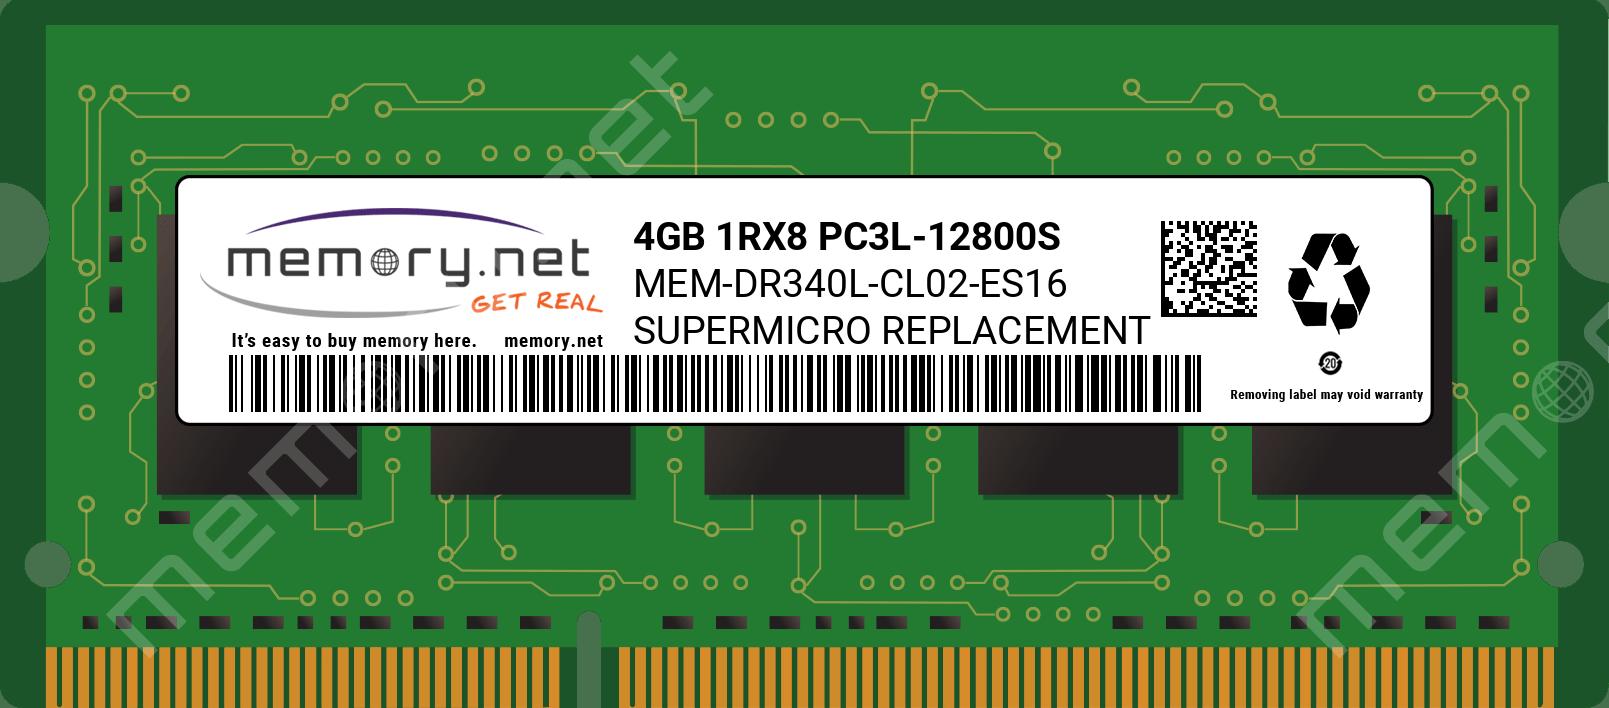 MEM-DR340L-CL02-ES16